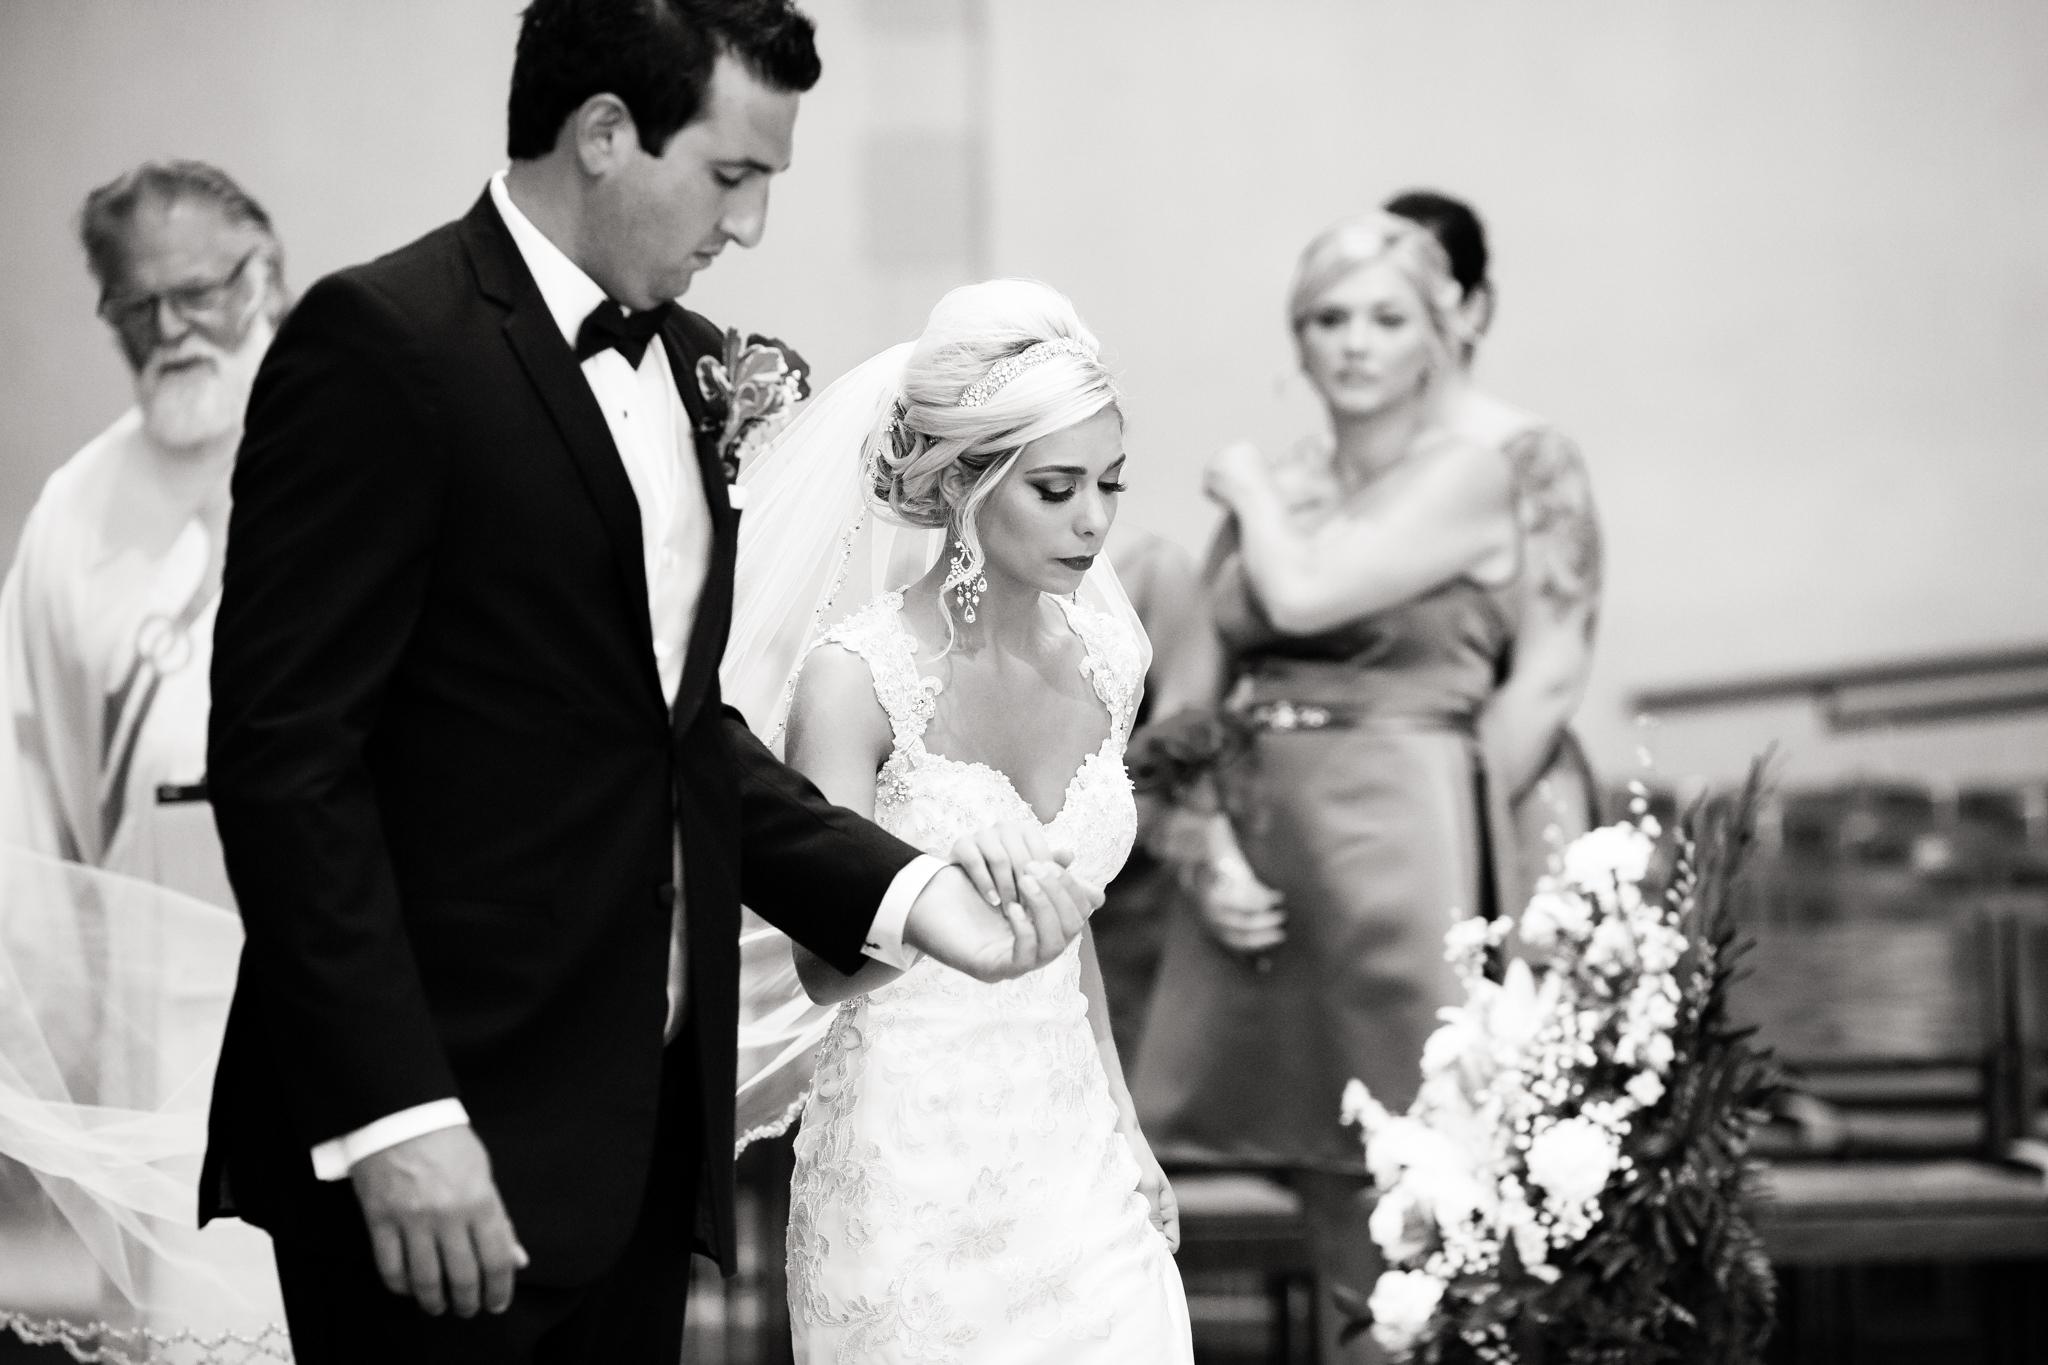 Statler-City-Buffalo-wedding-photographer- 0217bw.jpg